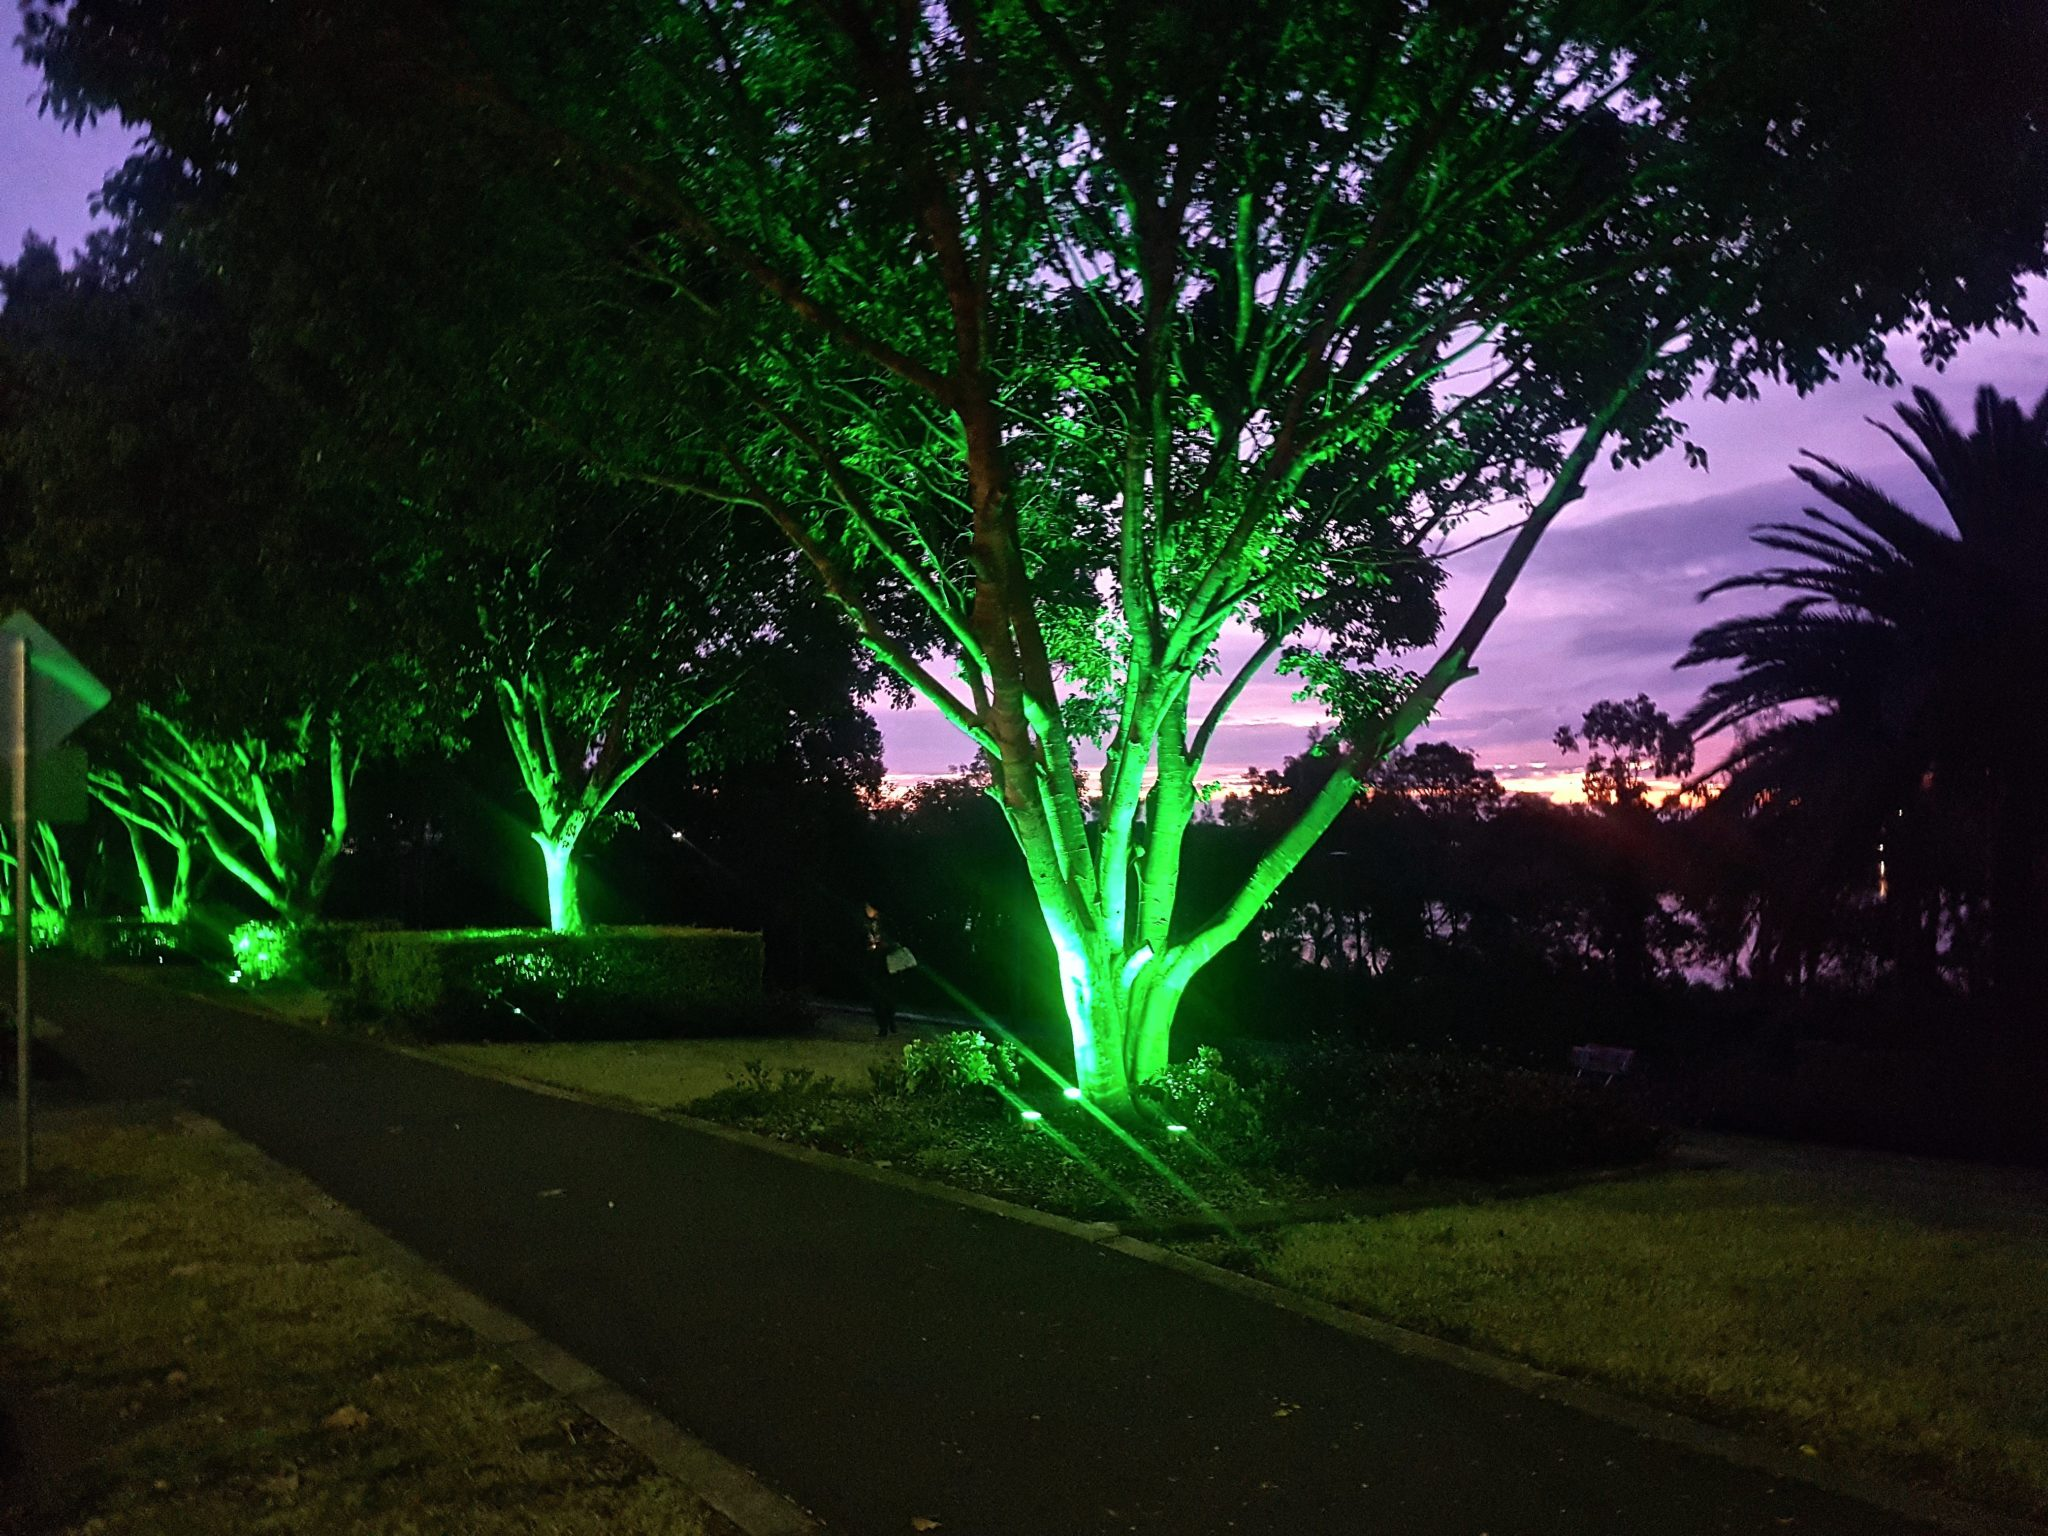 Rhodes lighting display by Limelight Australia